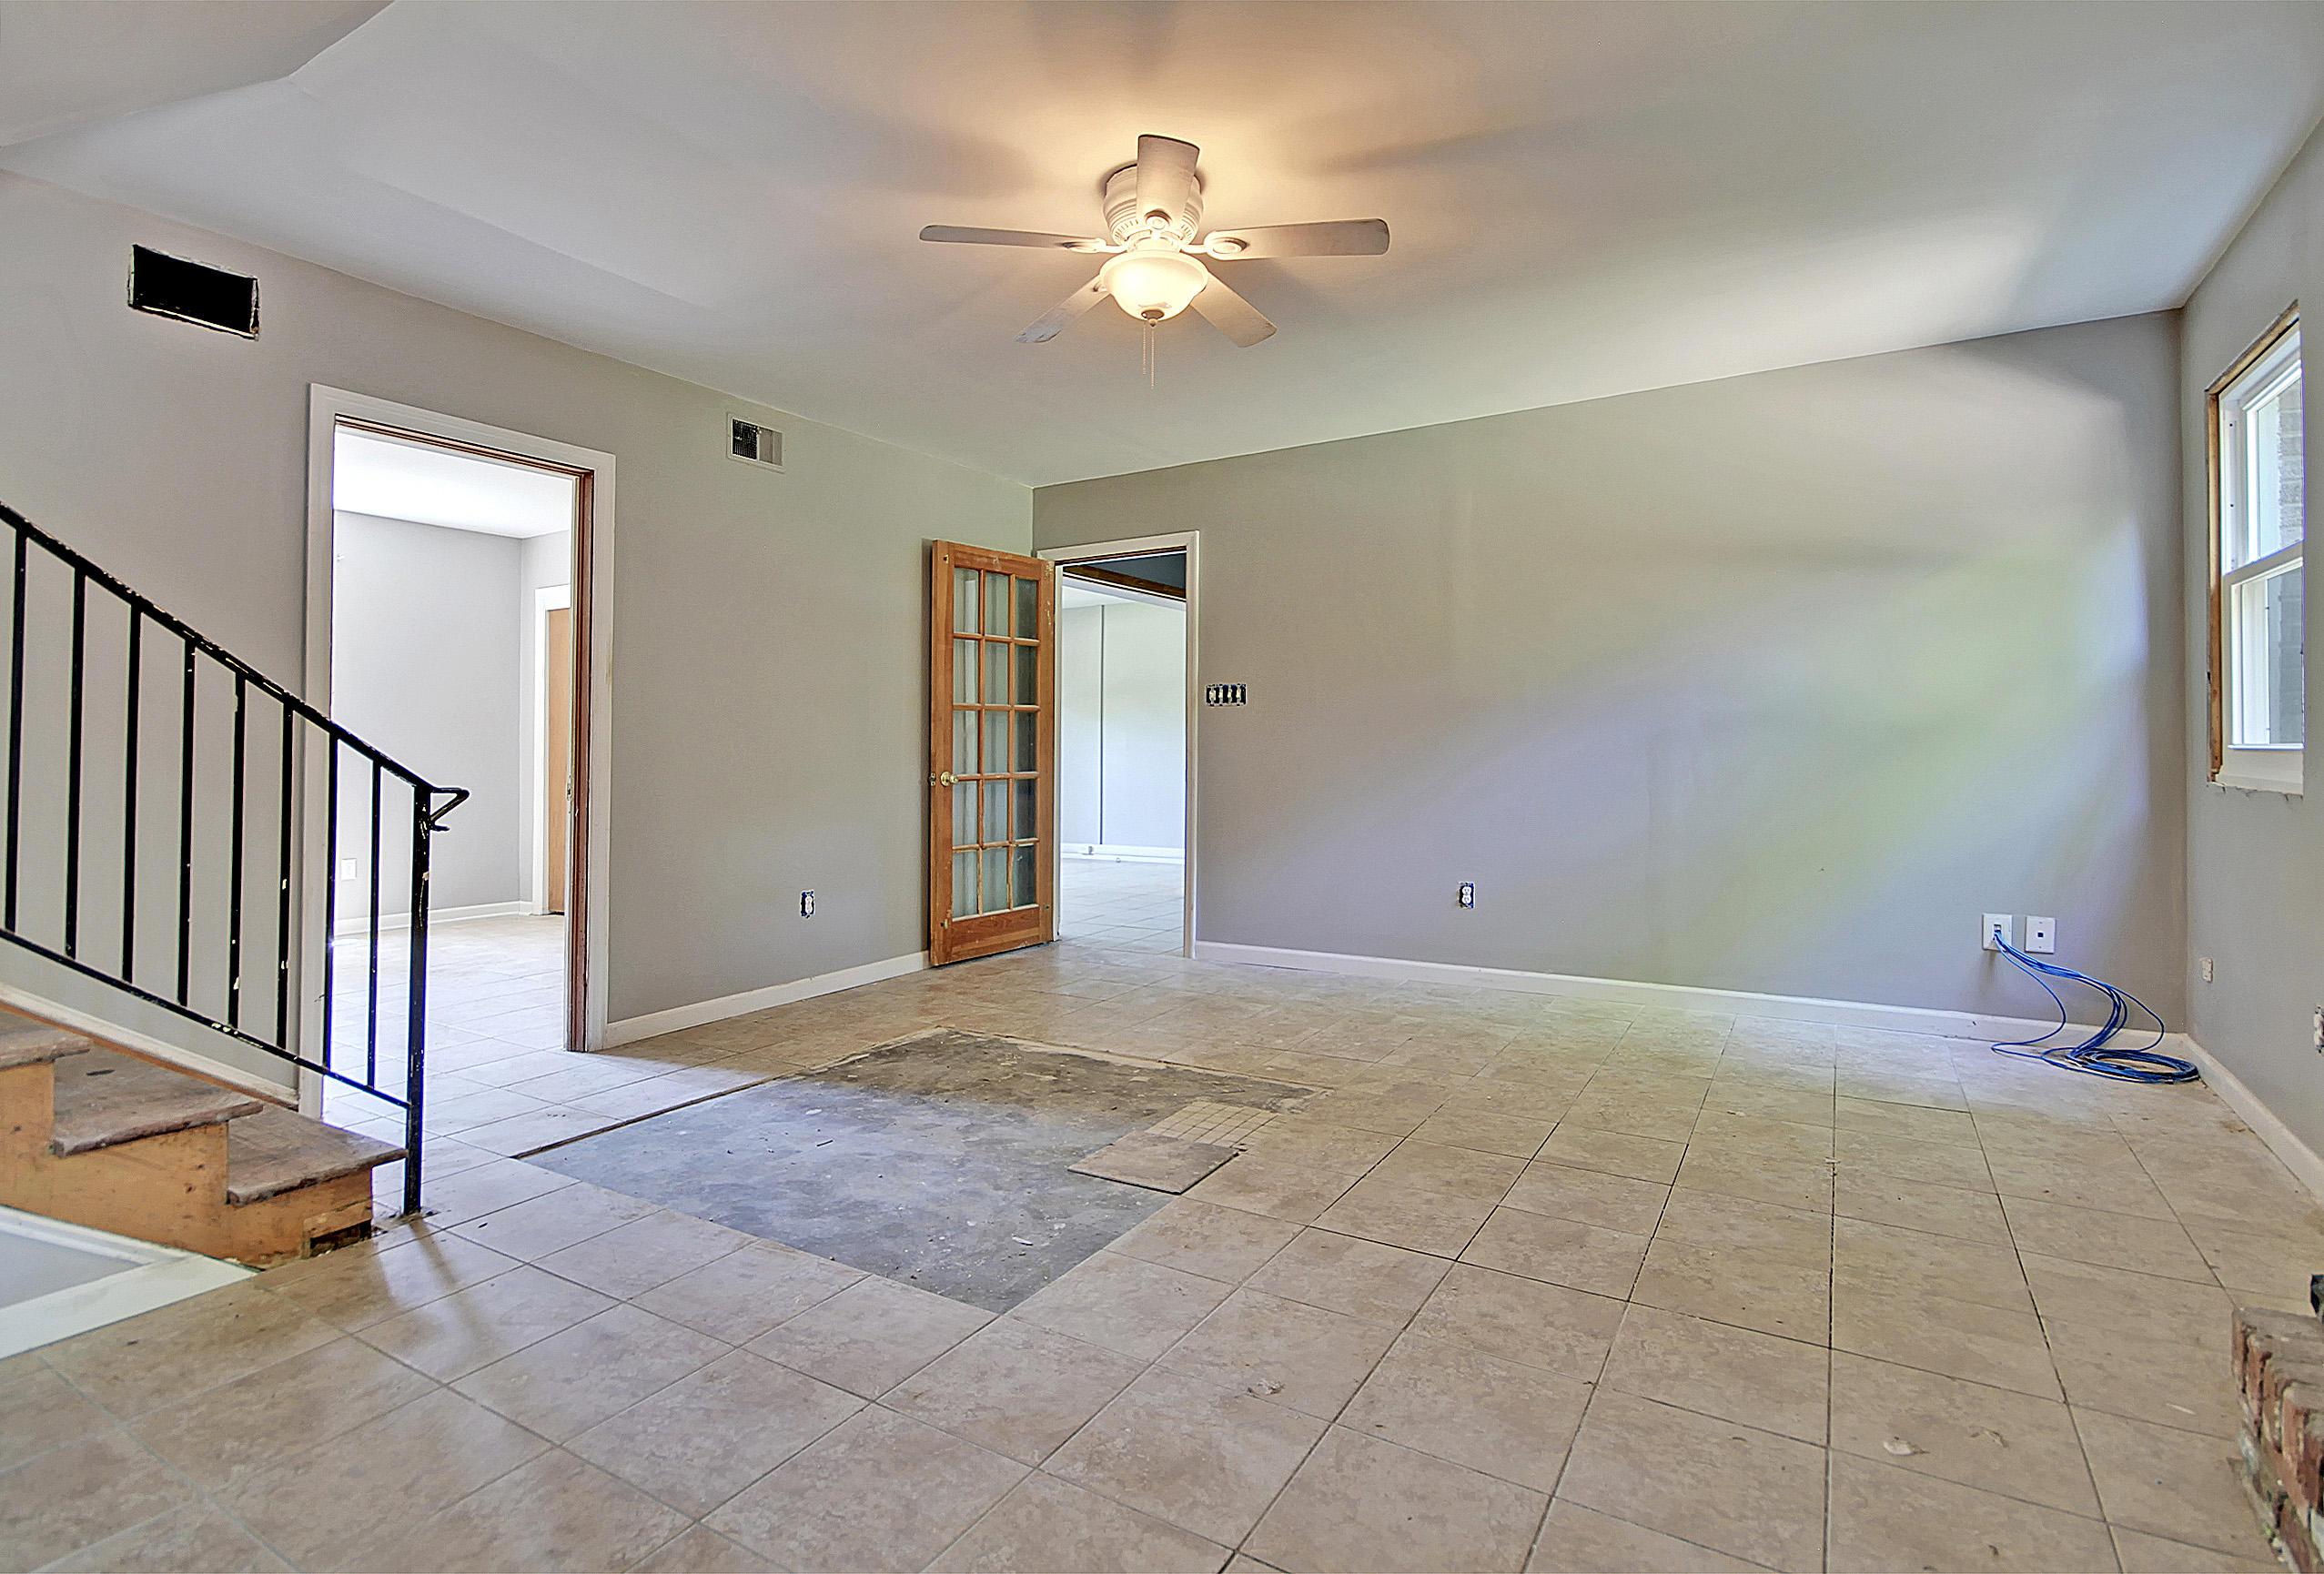 Northbridge Terrace Homes For Sale - 1094 Northbridge, Charleston, SC - 24